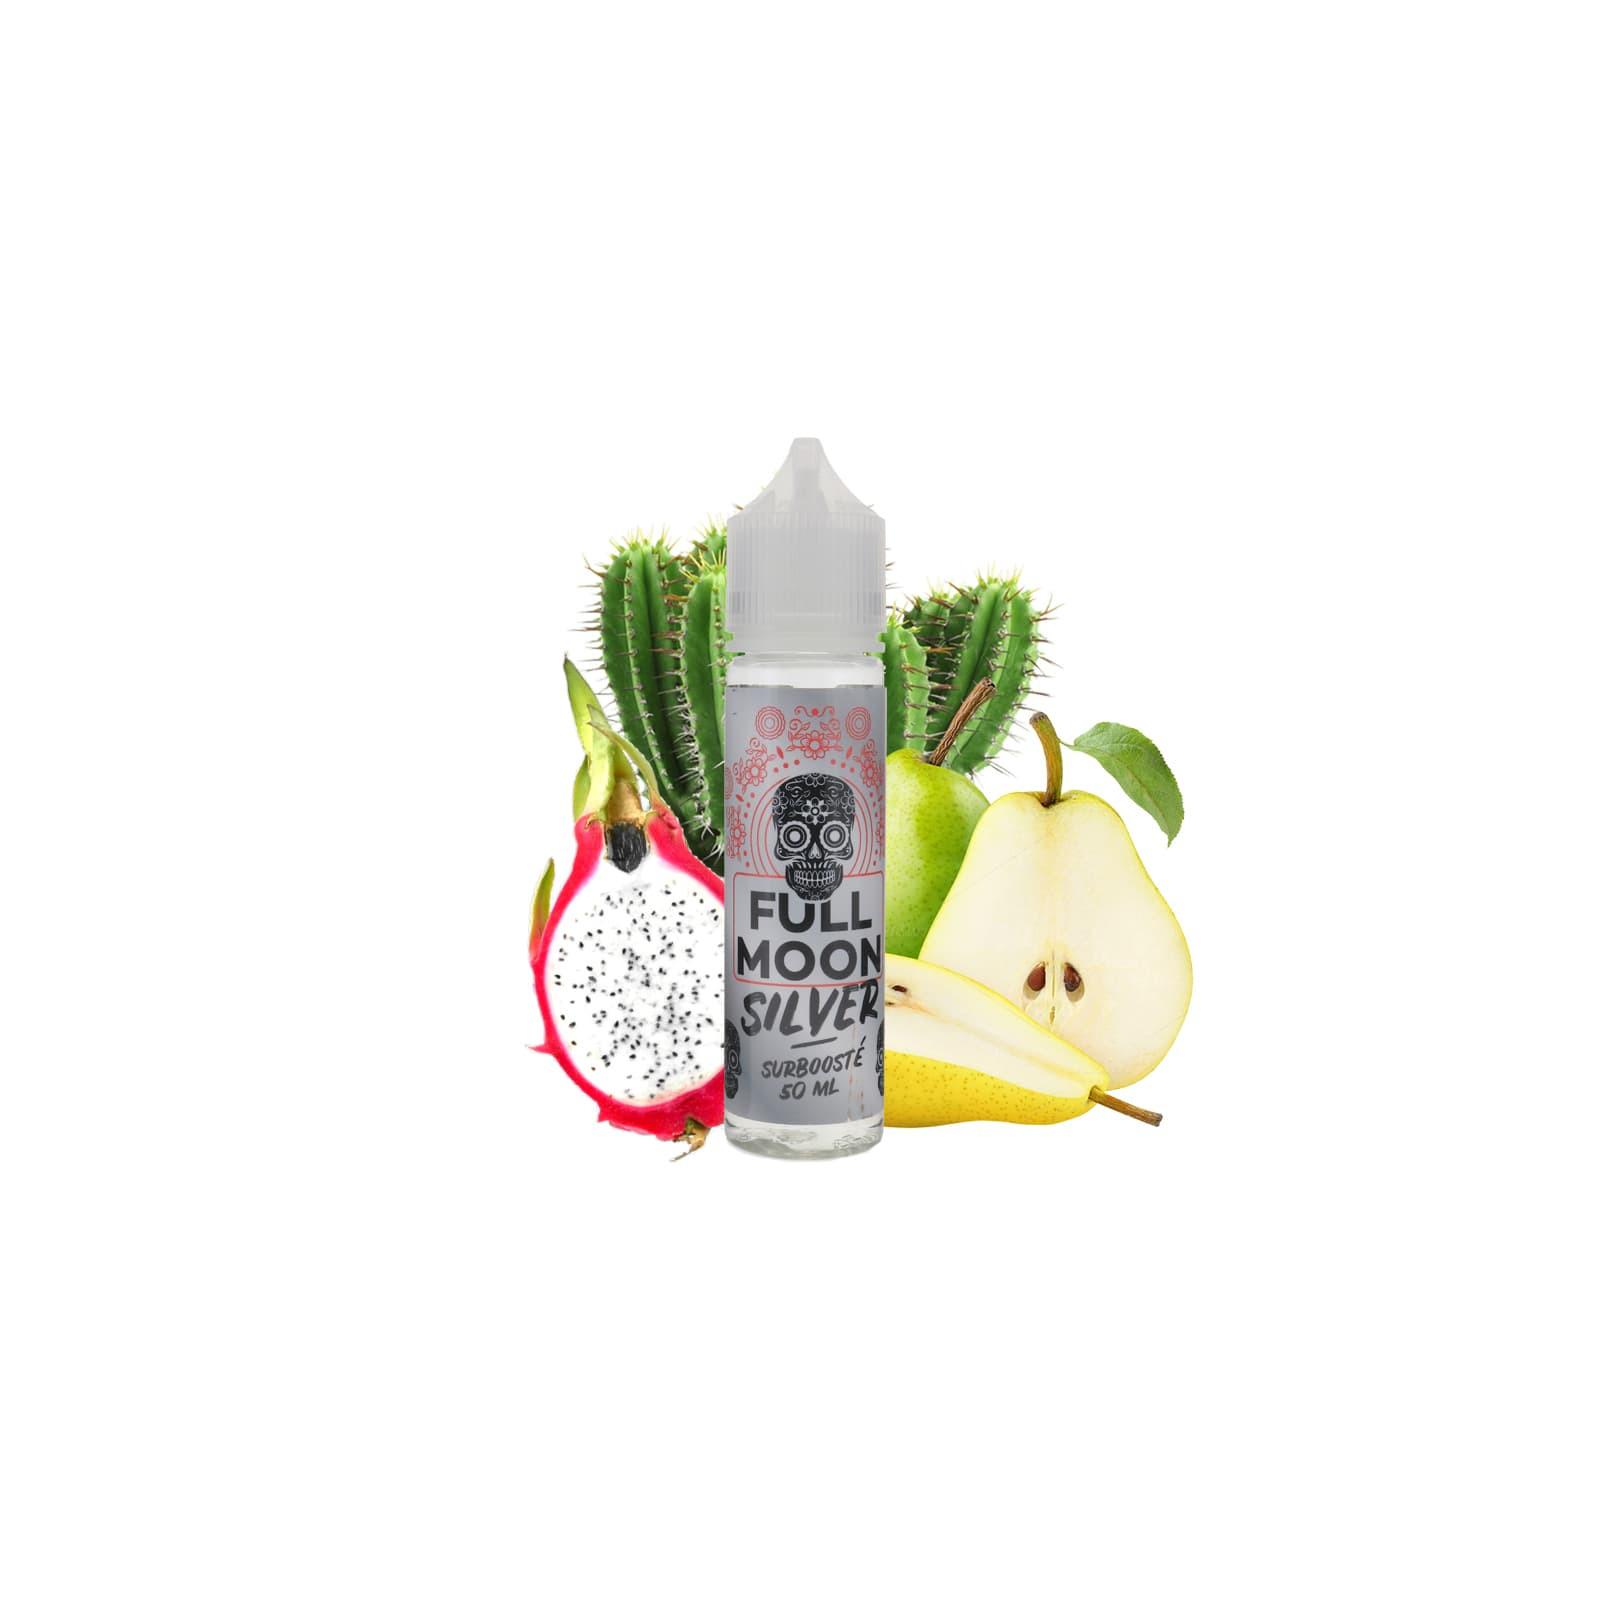 Silver 50ml - Full Moon